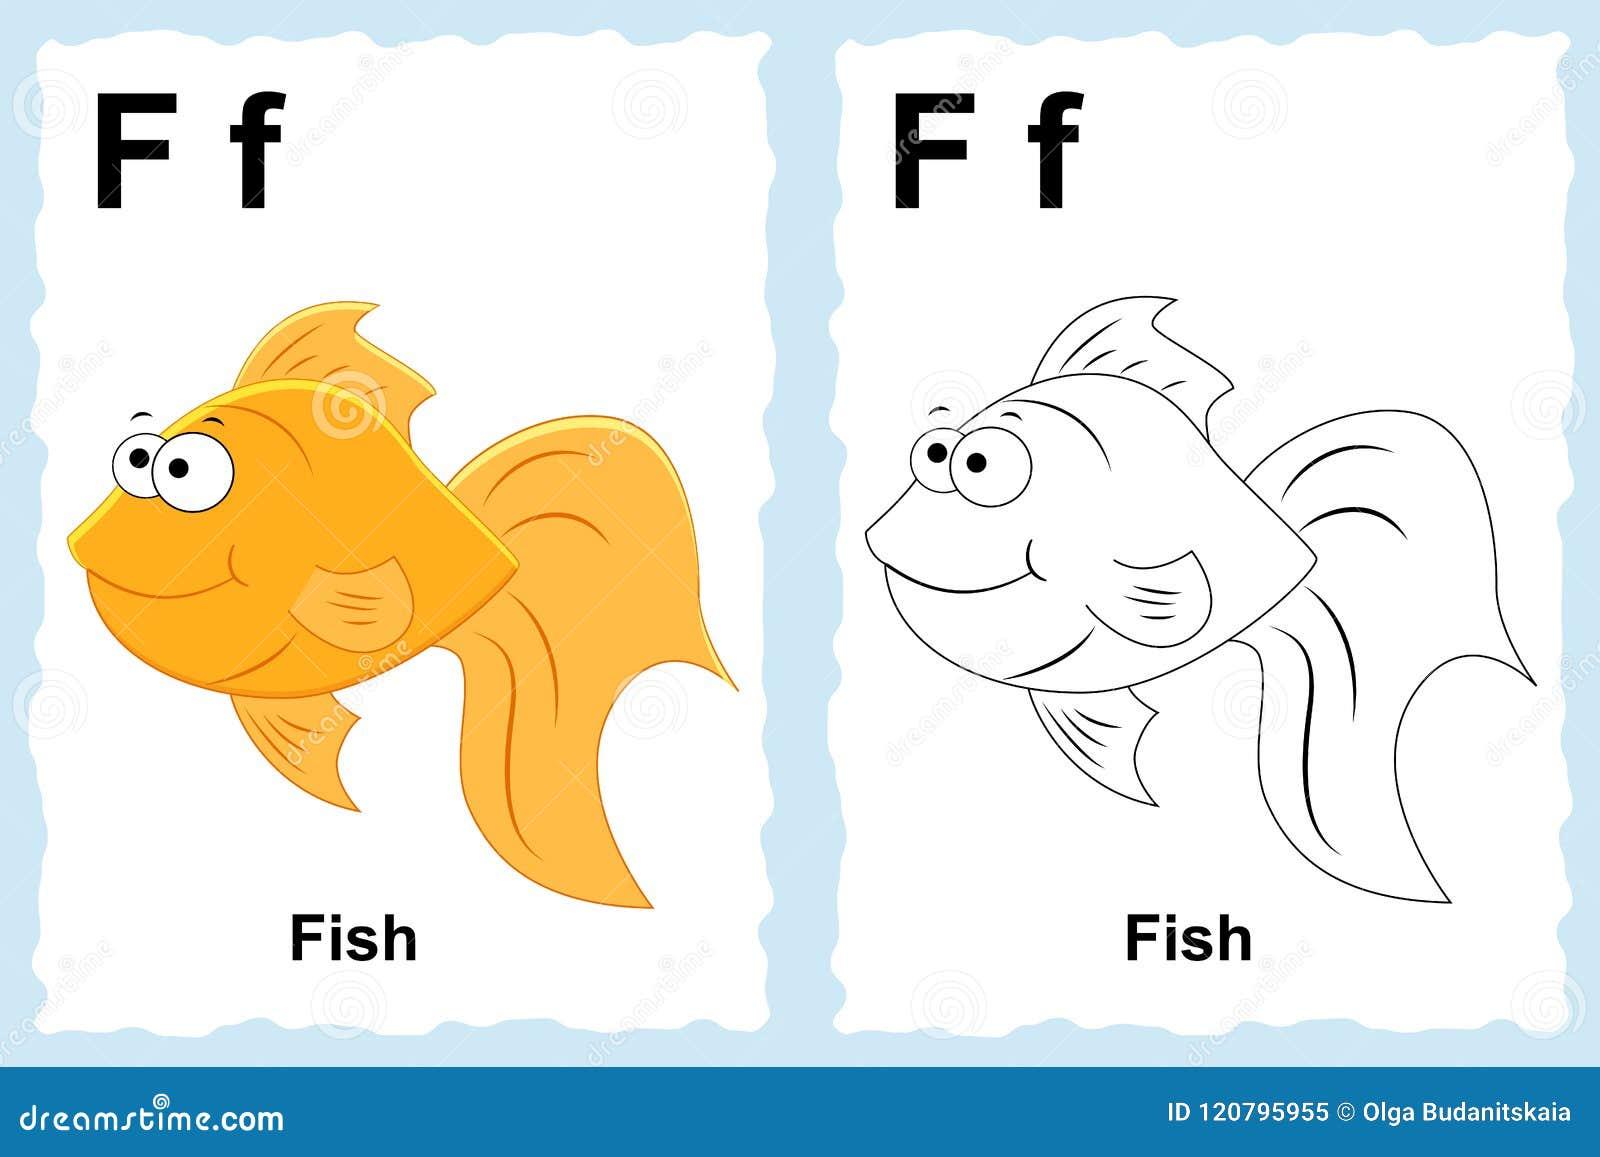 alphabet coloring book page outline clip art to color lett alphabet coloring book page outline clip art to color letter